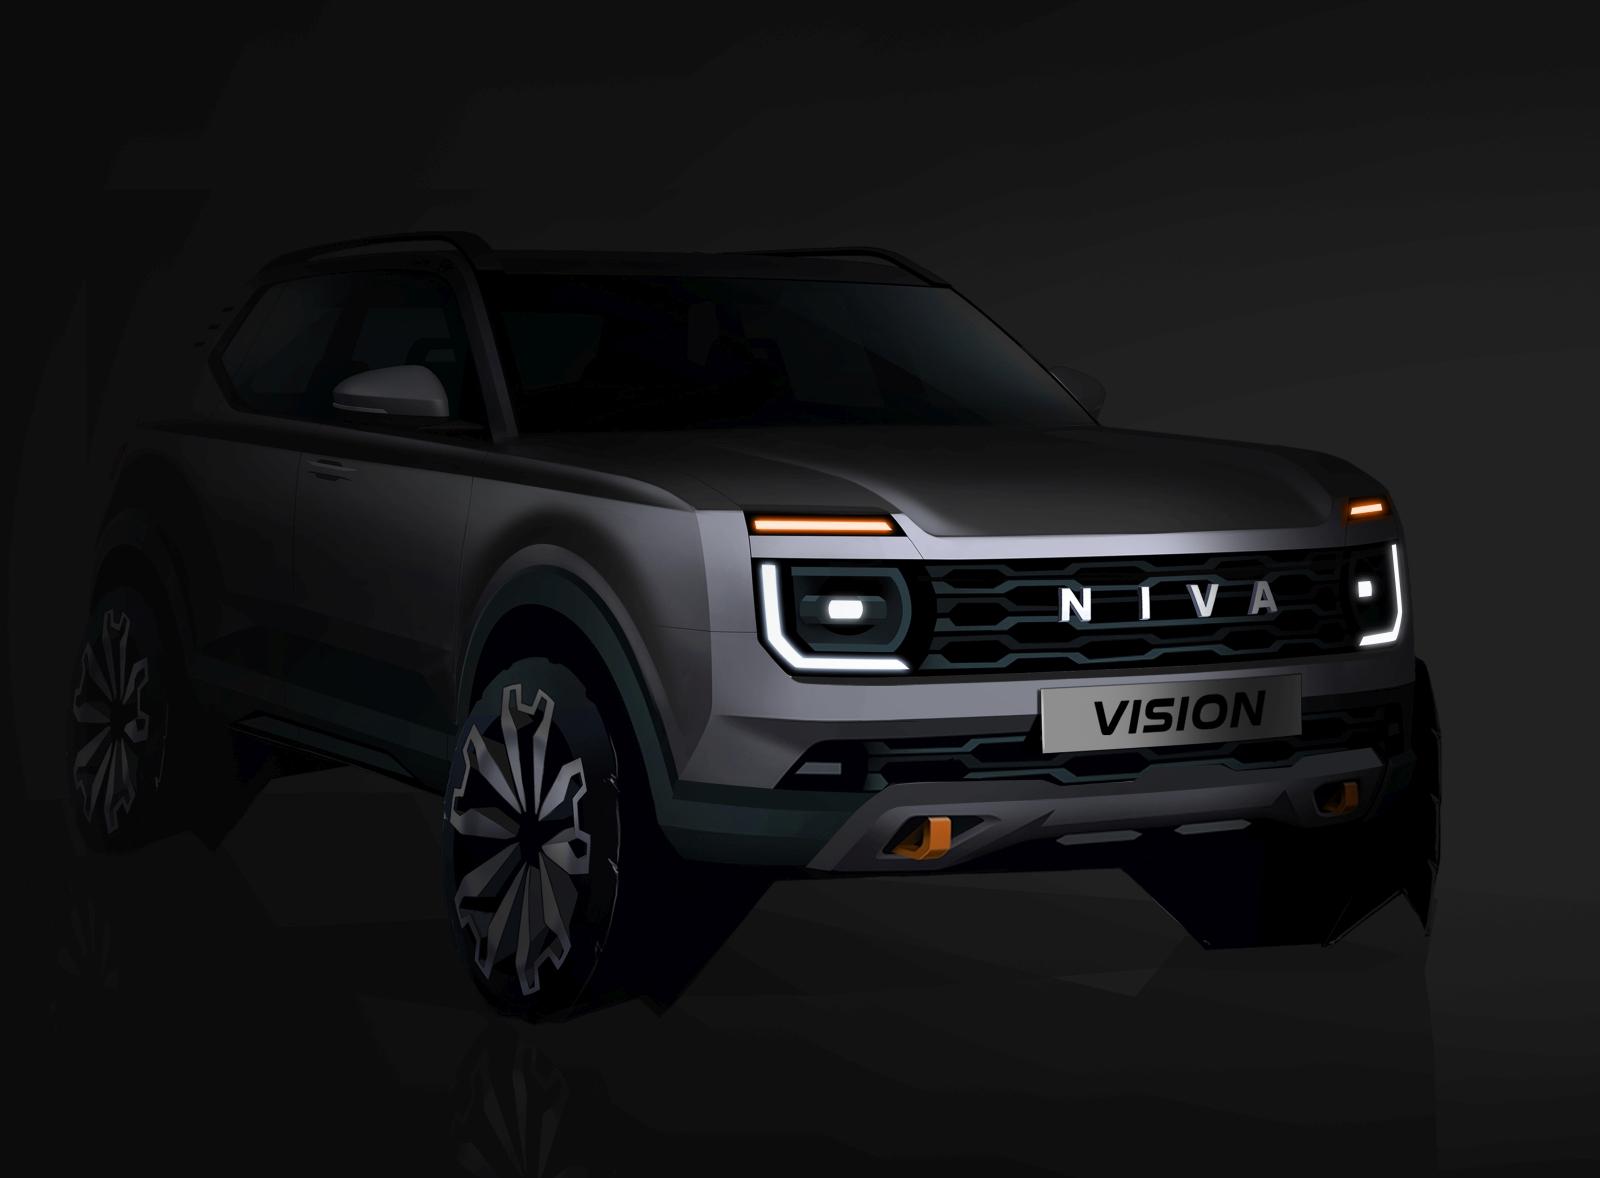 2021 - Lada Niva Vision